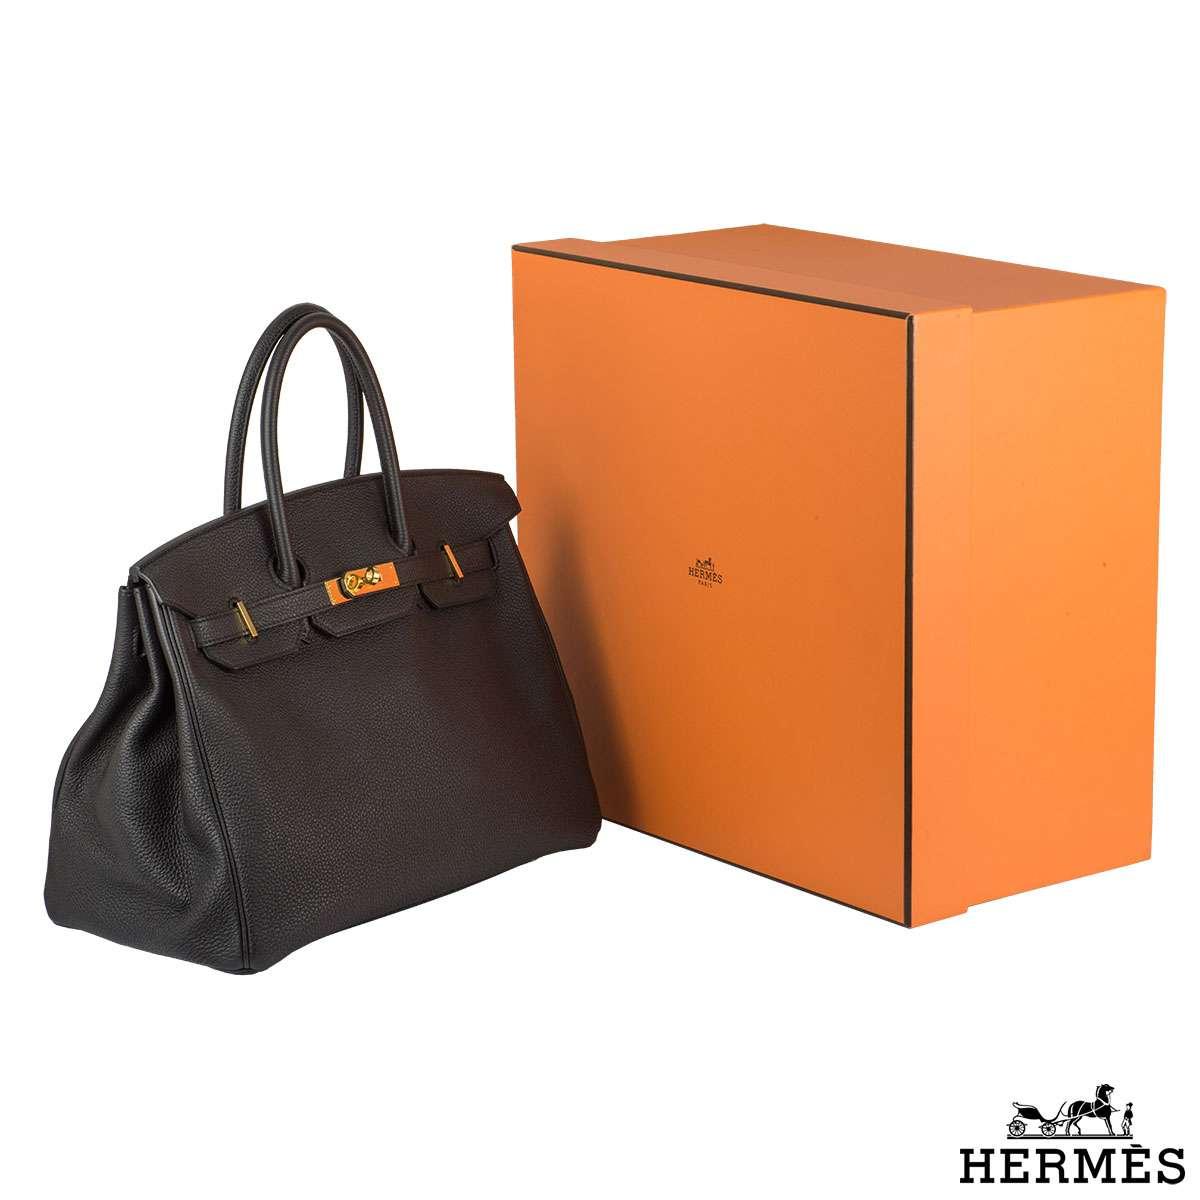 Hermes Birkin 35cm Togo Leather Handbag